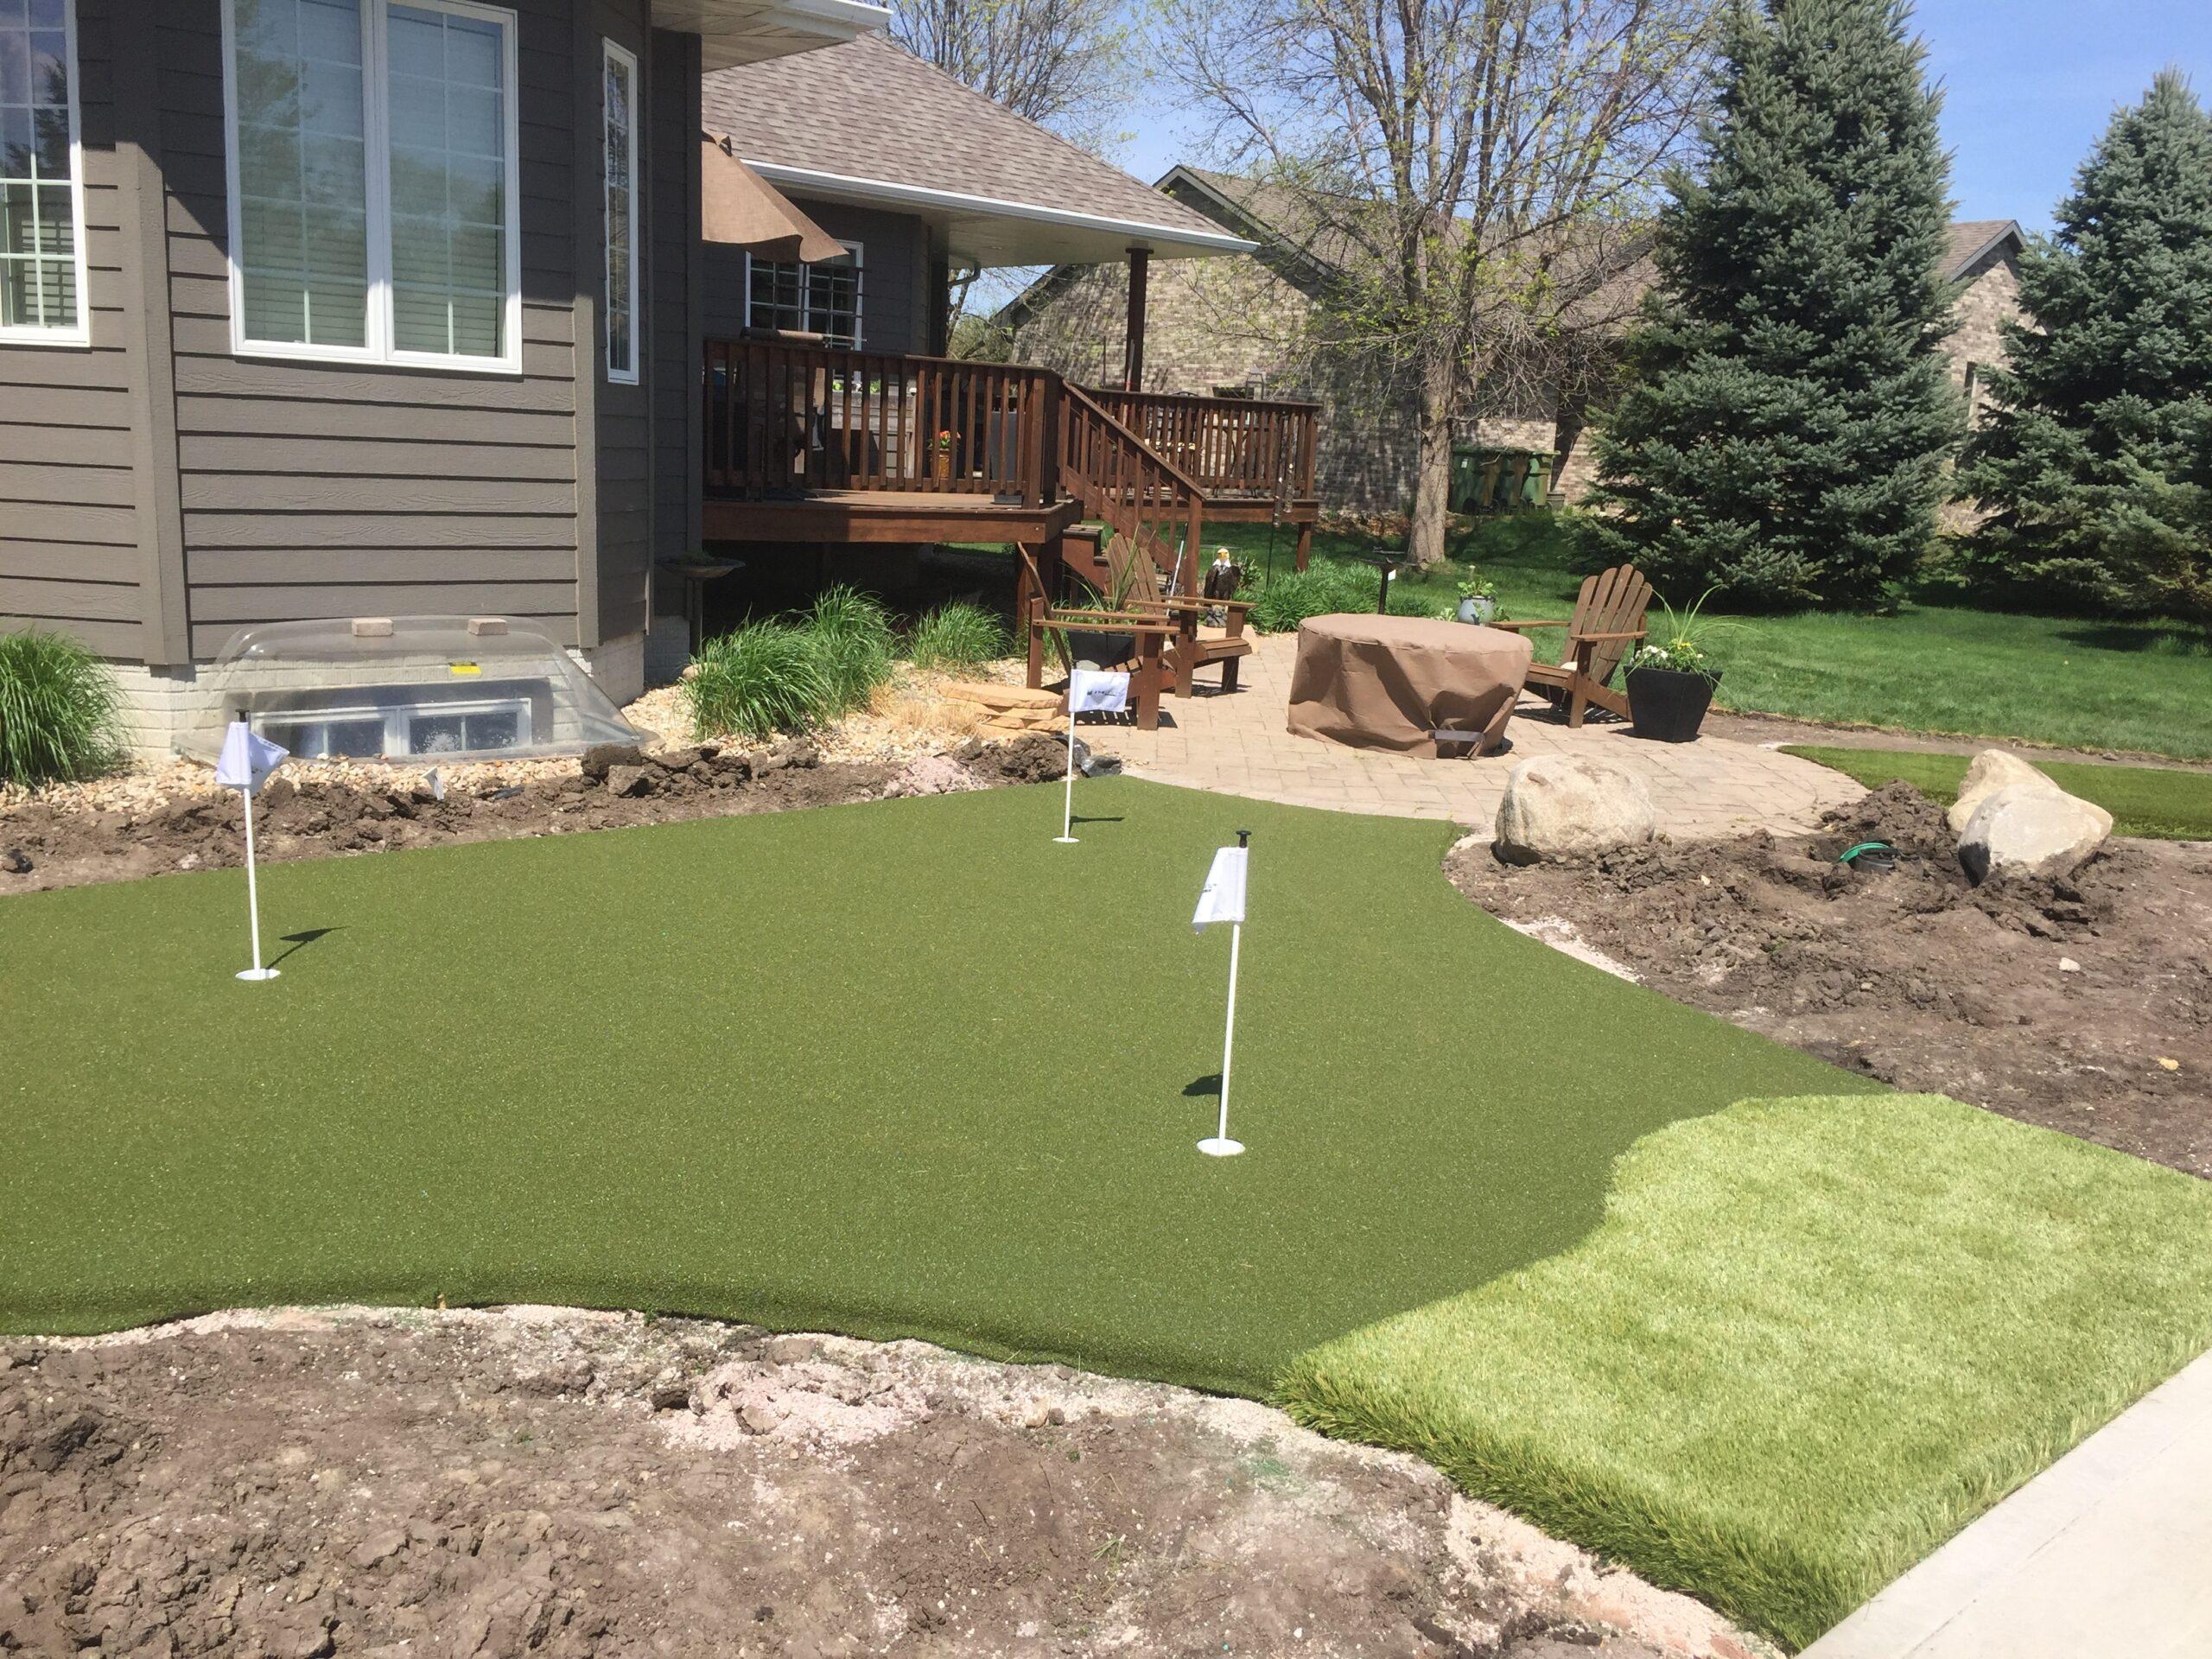 artificial grass, putting green in backyard